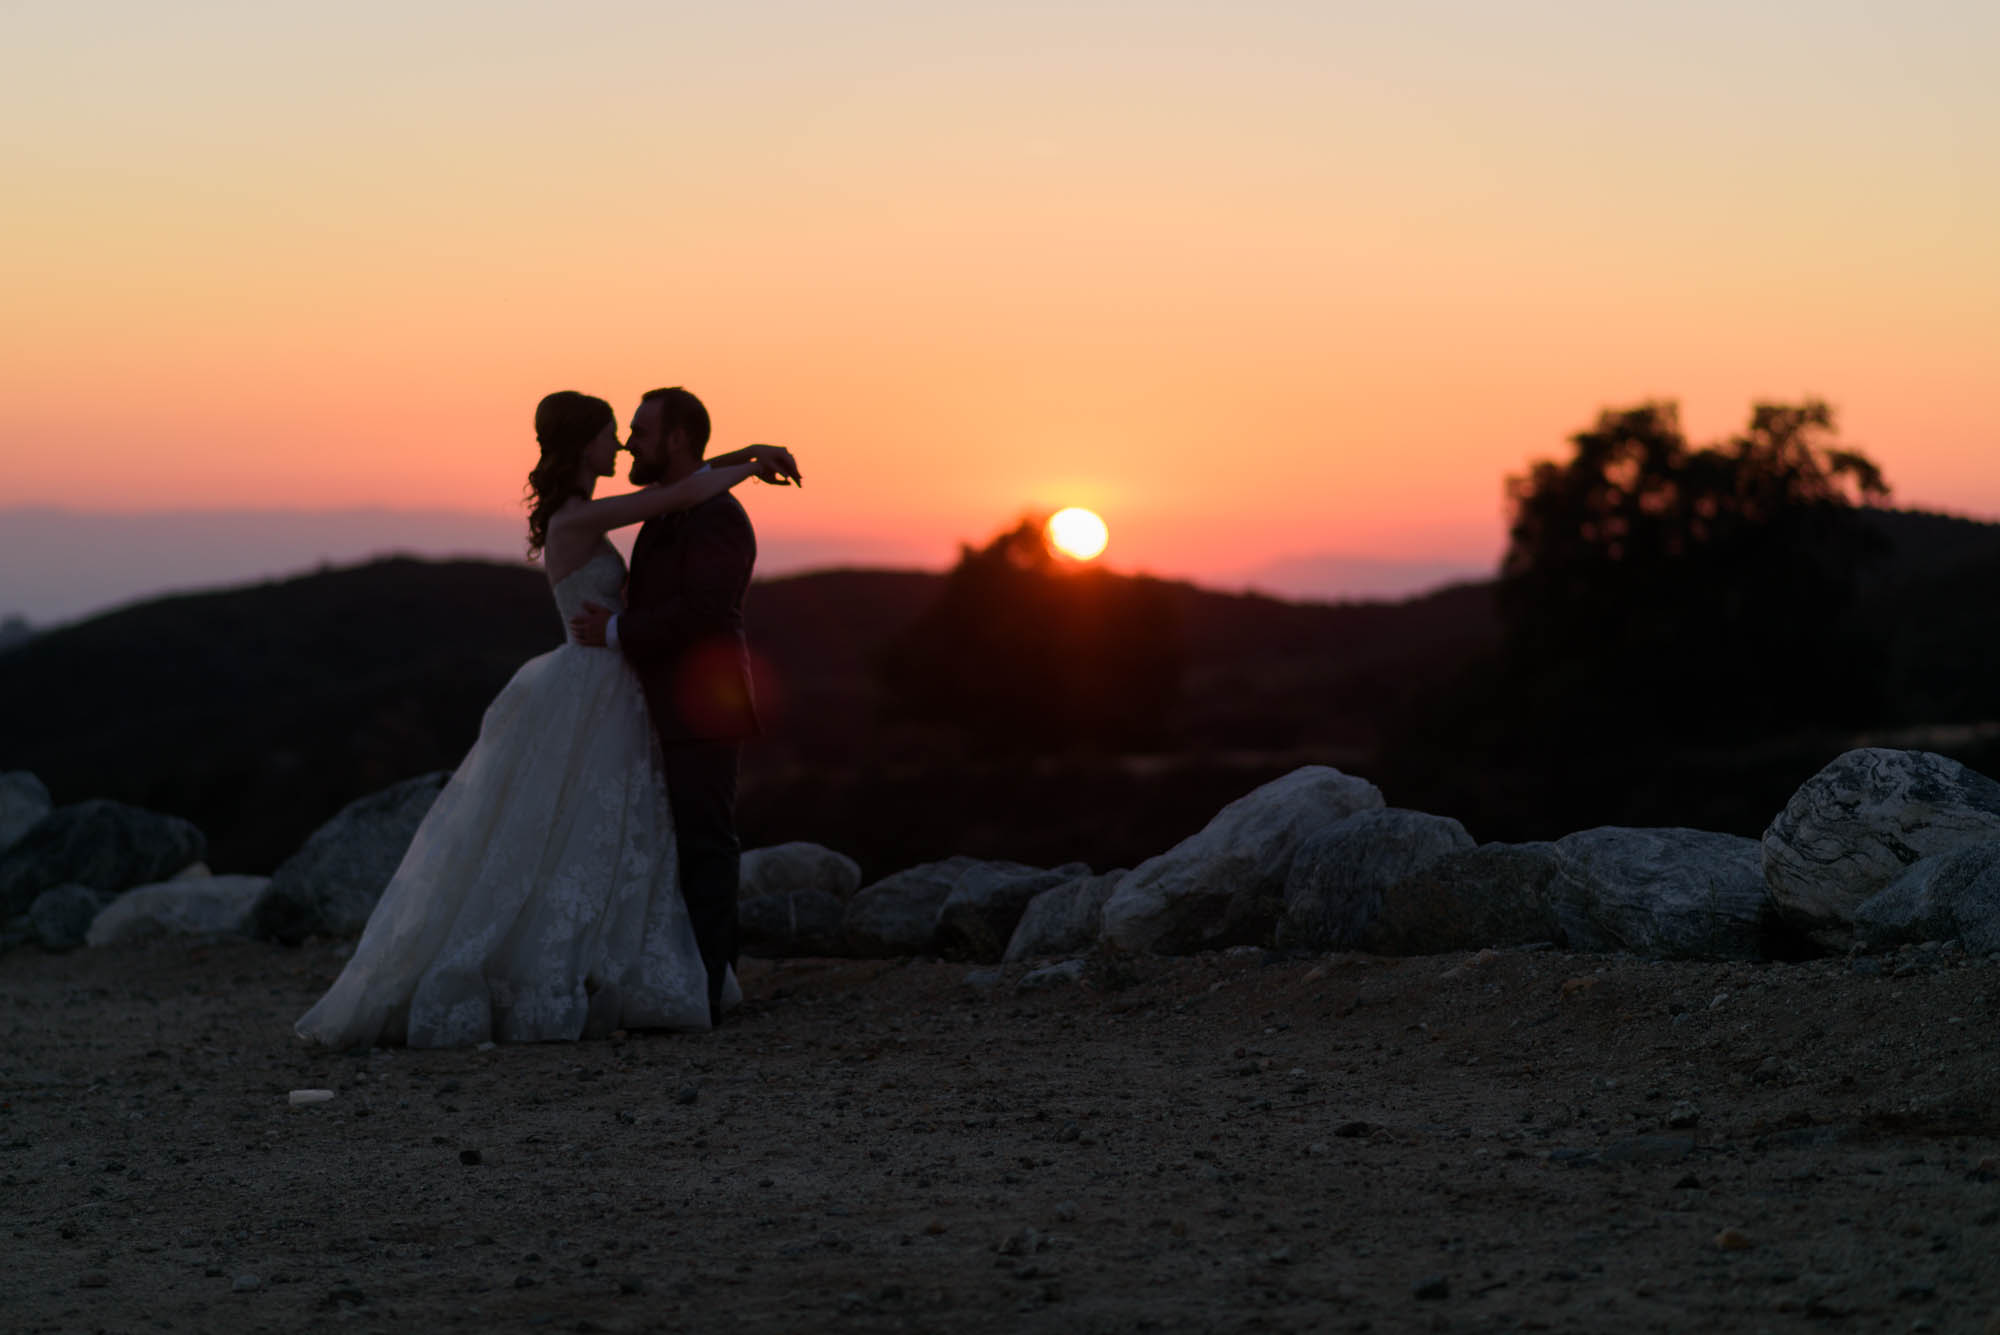 626_Alan_and_Heidi_Serendipity_Garden_Wedding_10-27-2018